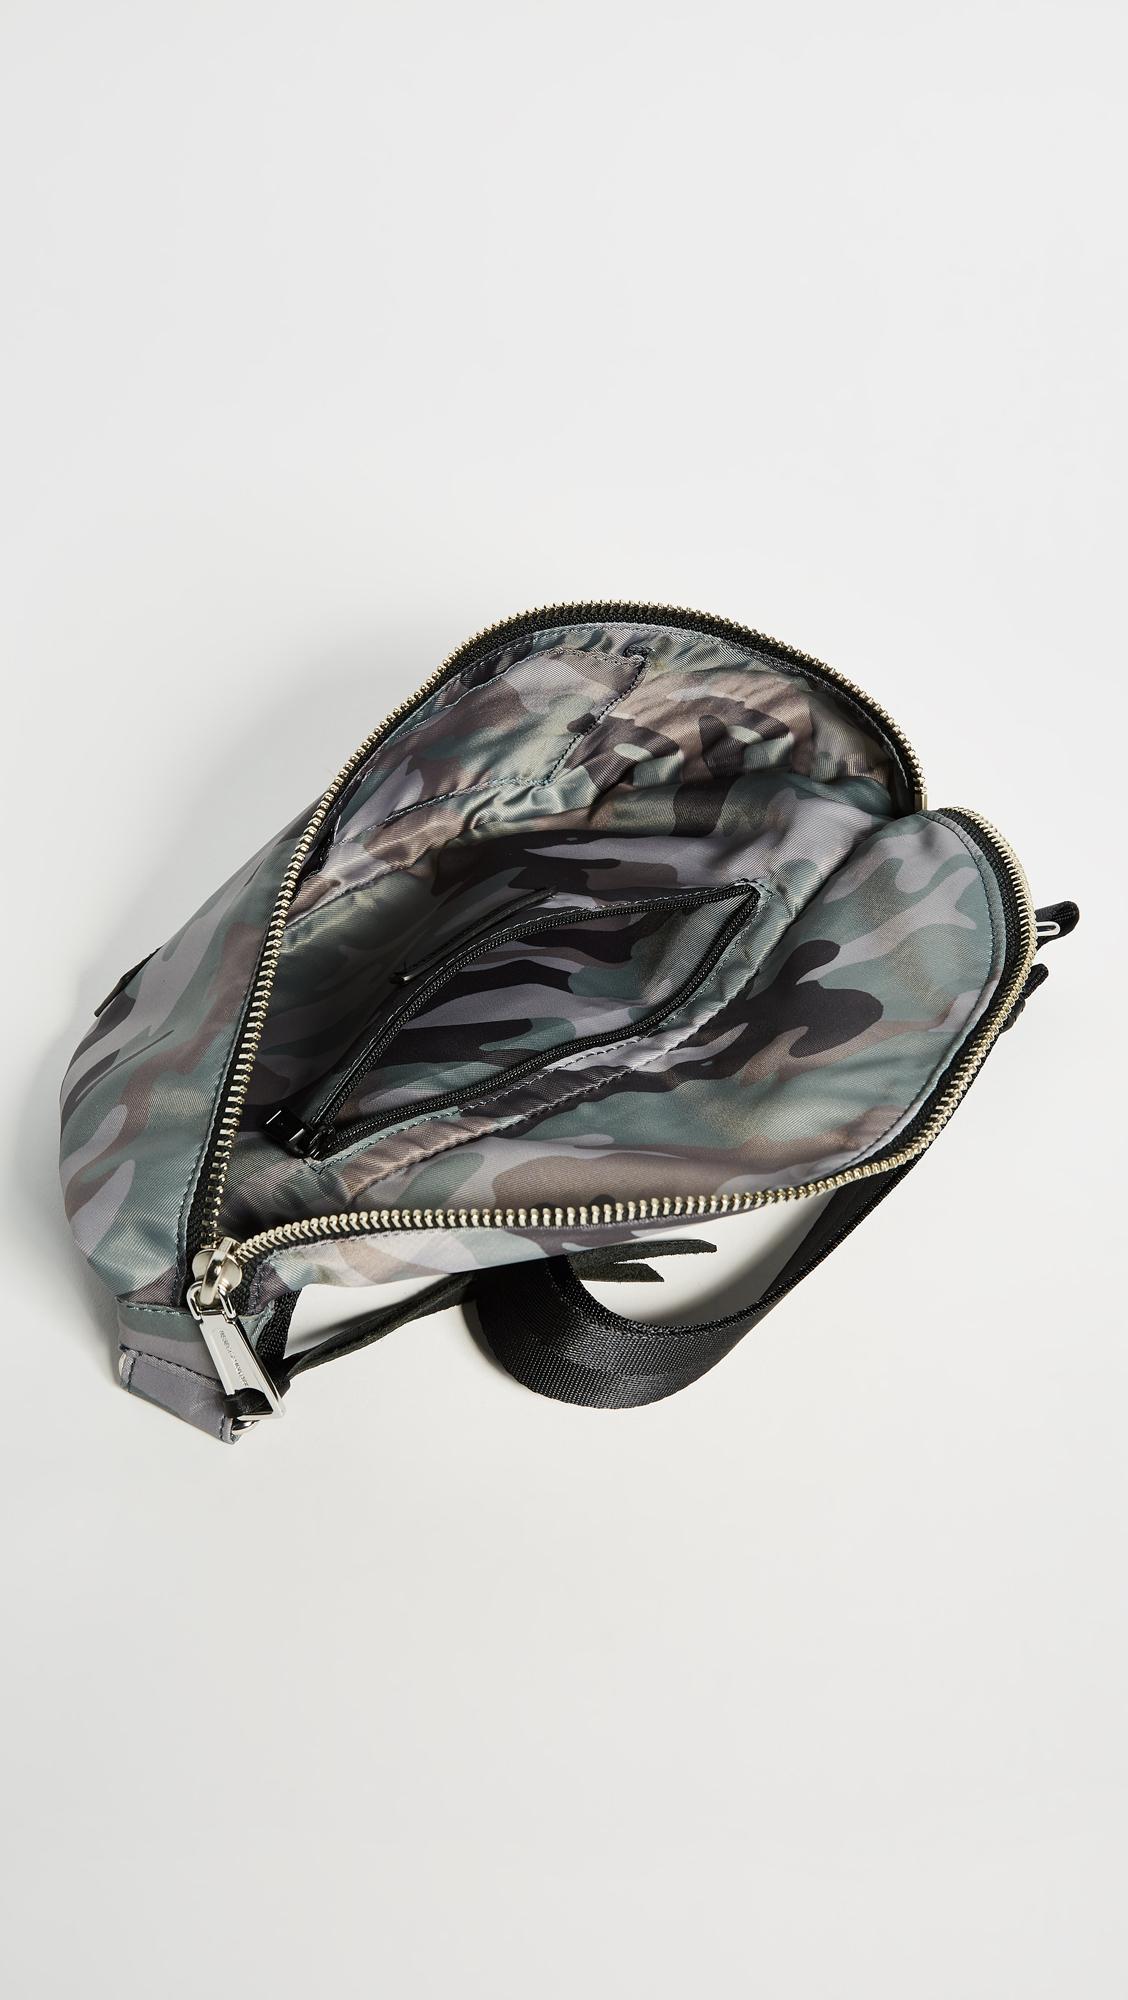 dcf2f858a0b Rebecca Minkoff Nylon Belt Bag In Camo Print